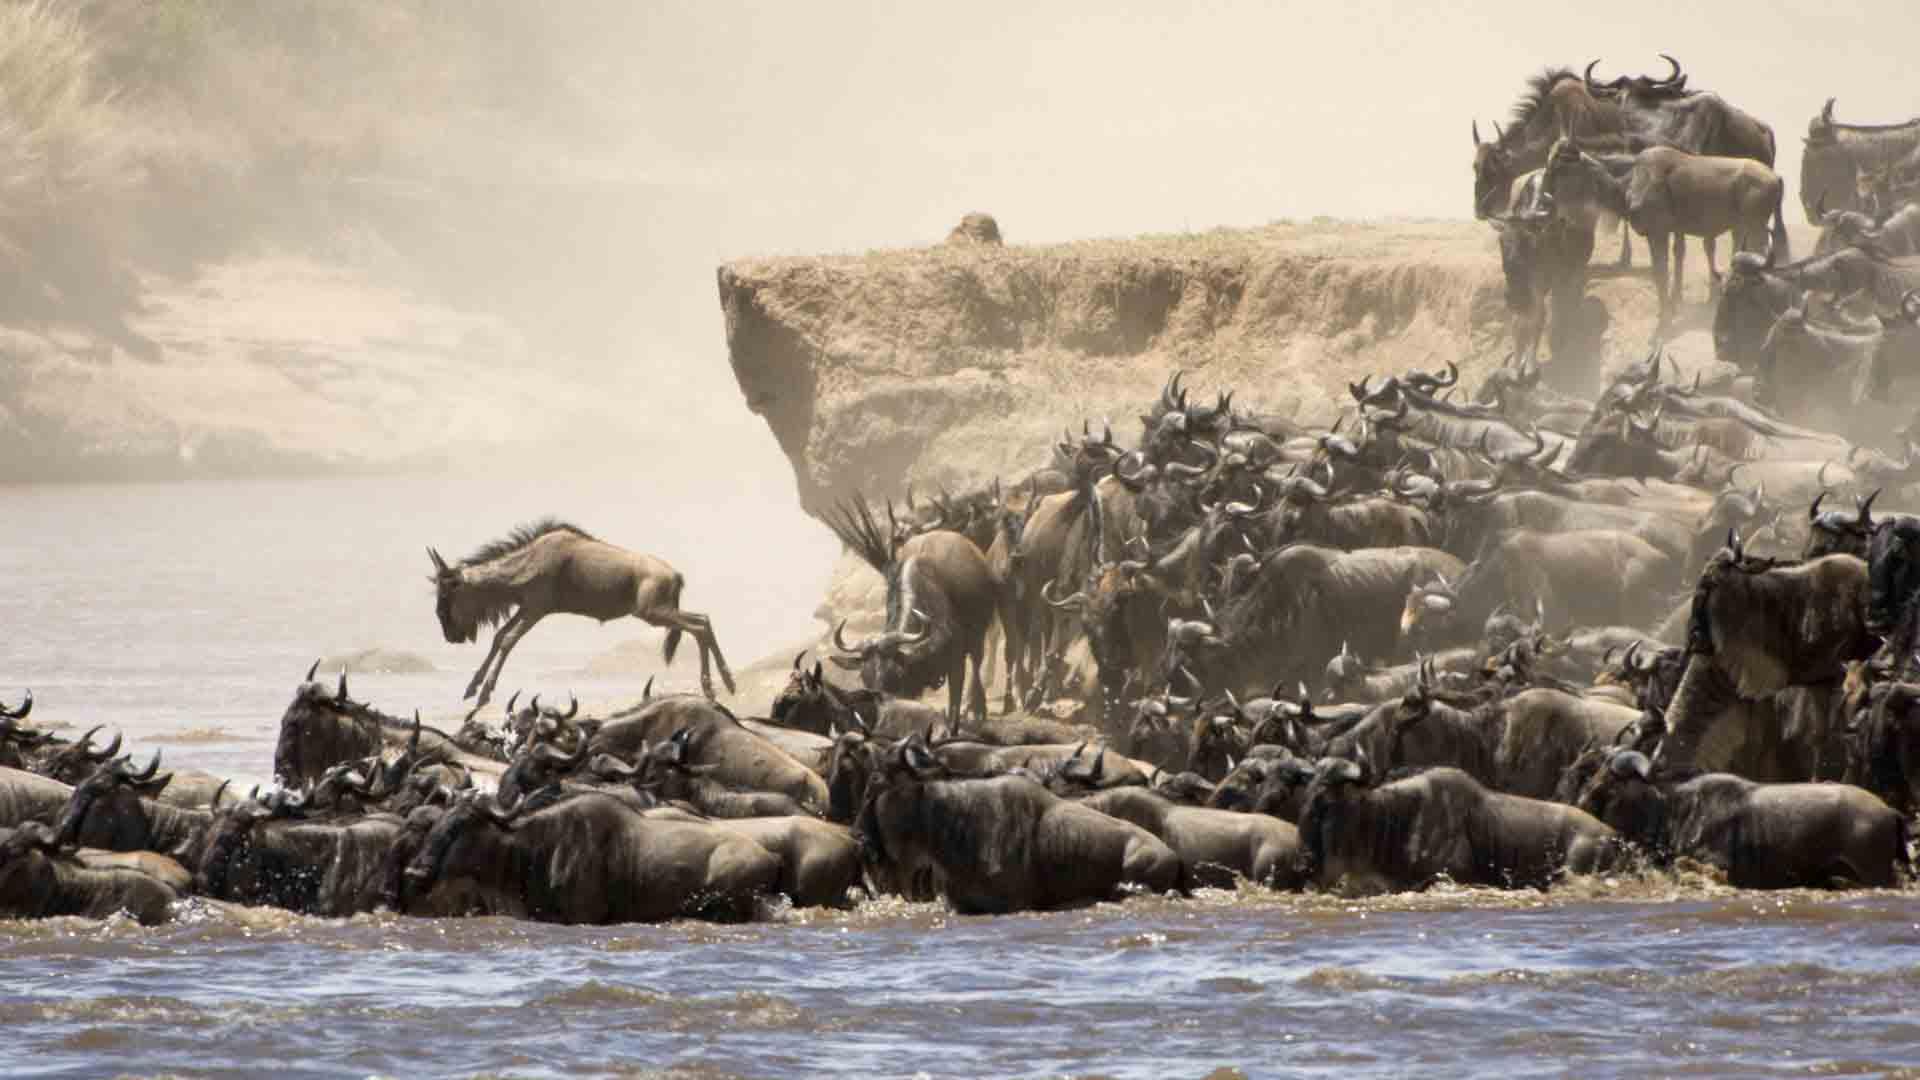 wildebeest-migration-safari-1.jpg